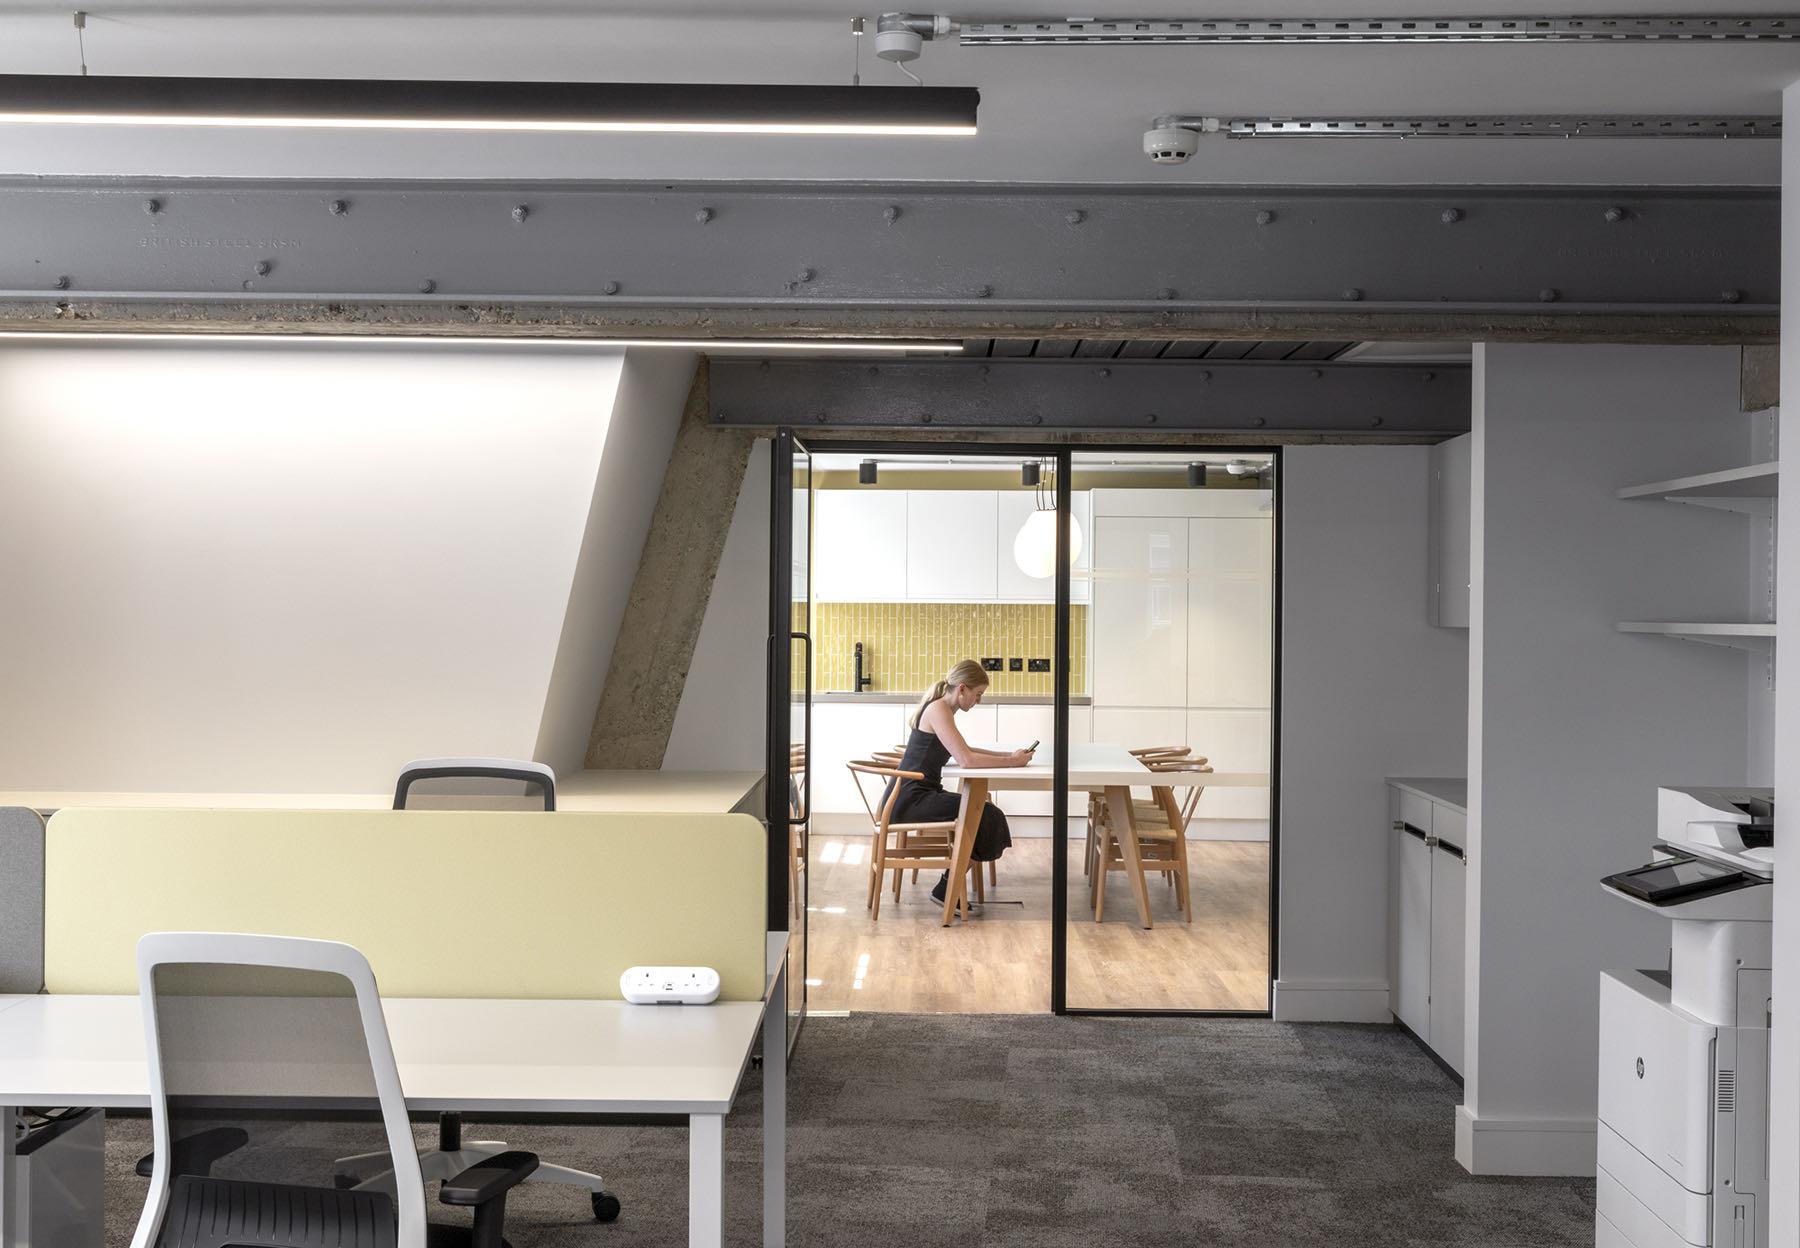 fredericks-place-london-office-14